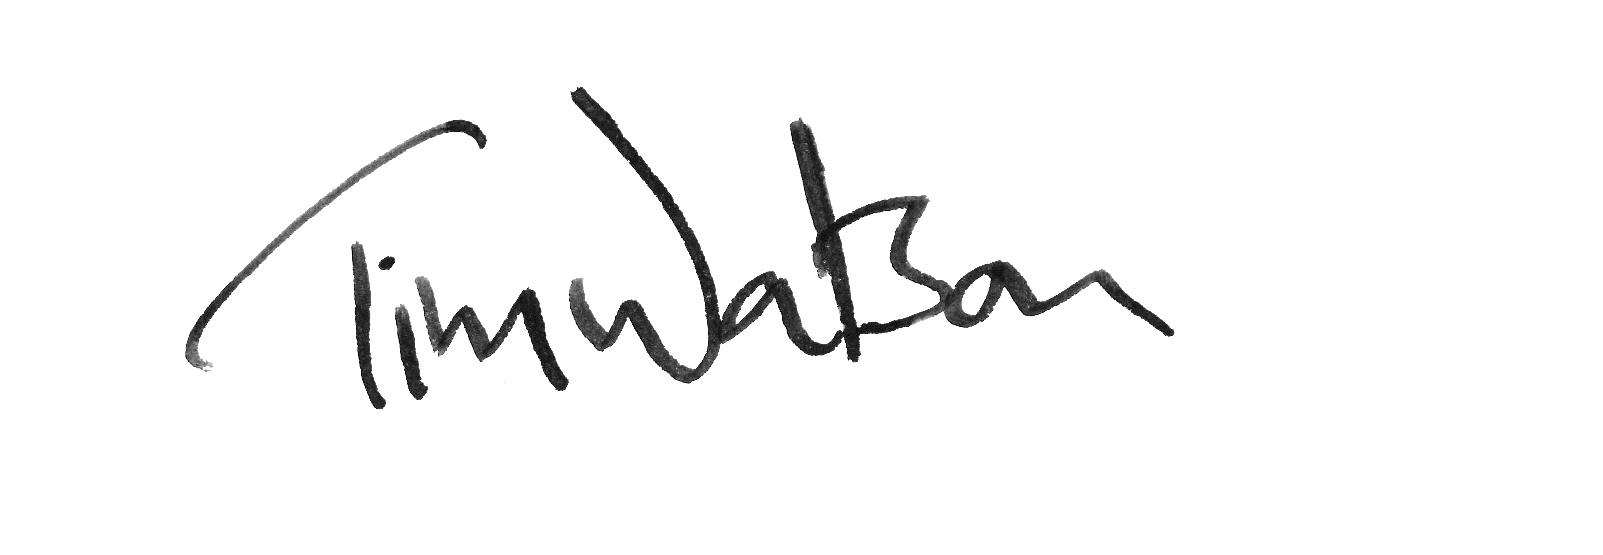 Tim Watson's Signature